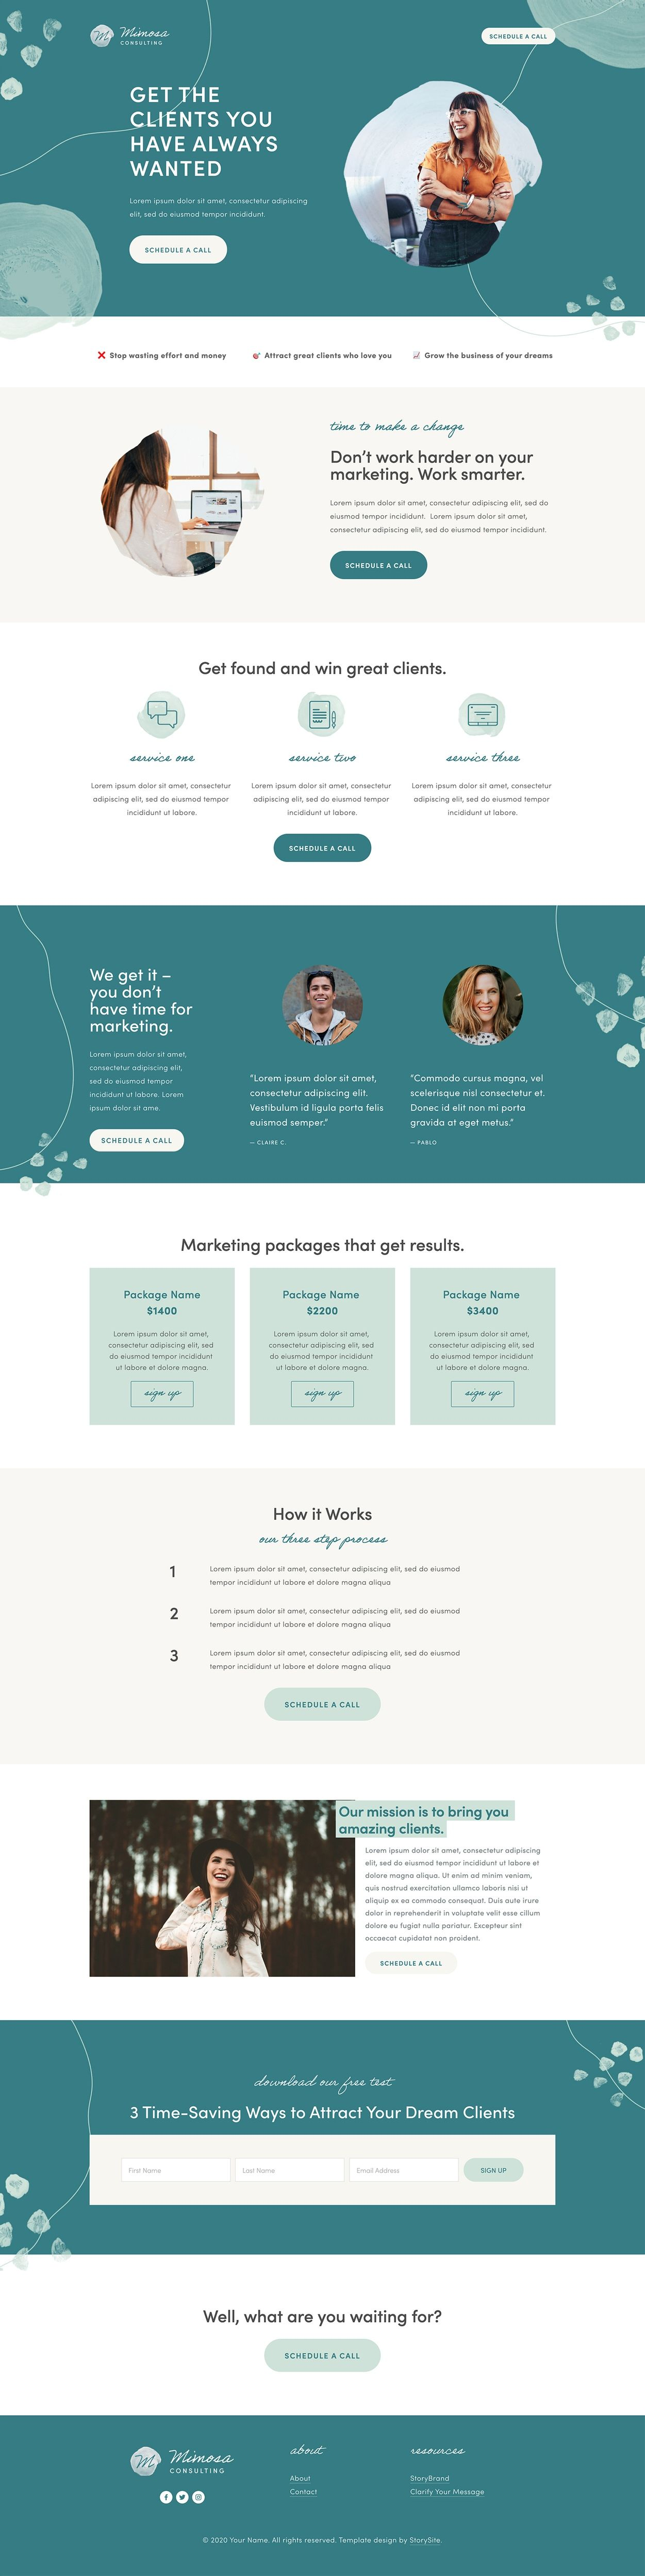 Storybrand Website Templates For Consultants Built On Squarespace En 2021 Web Design Design Responsive Webdesign Inspiration